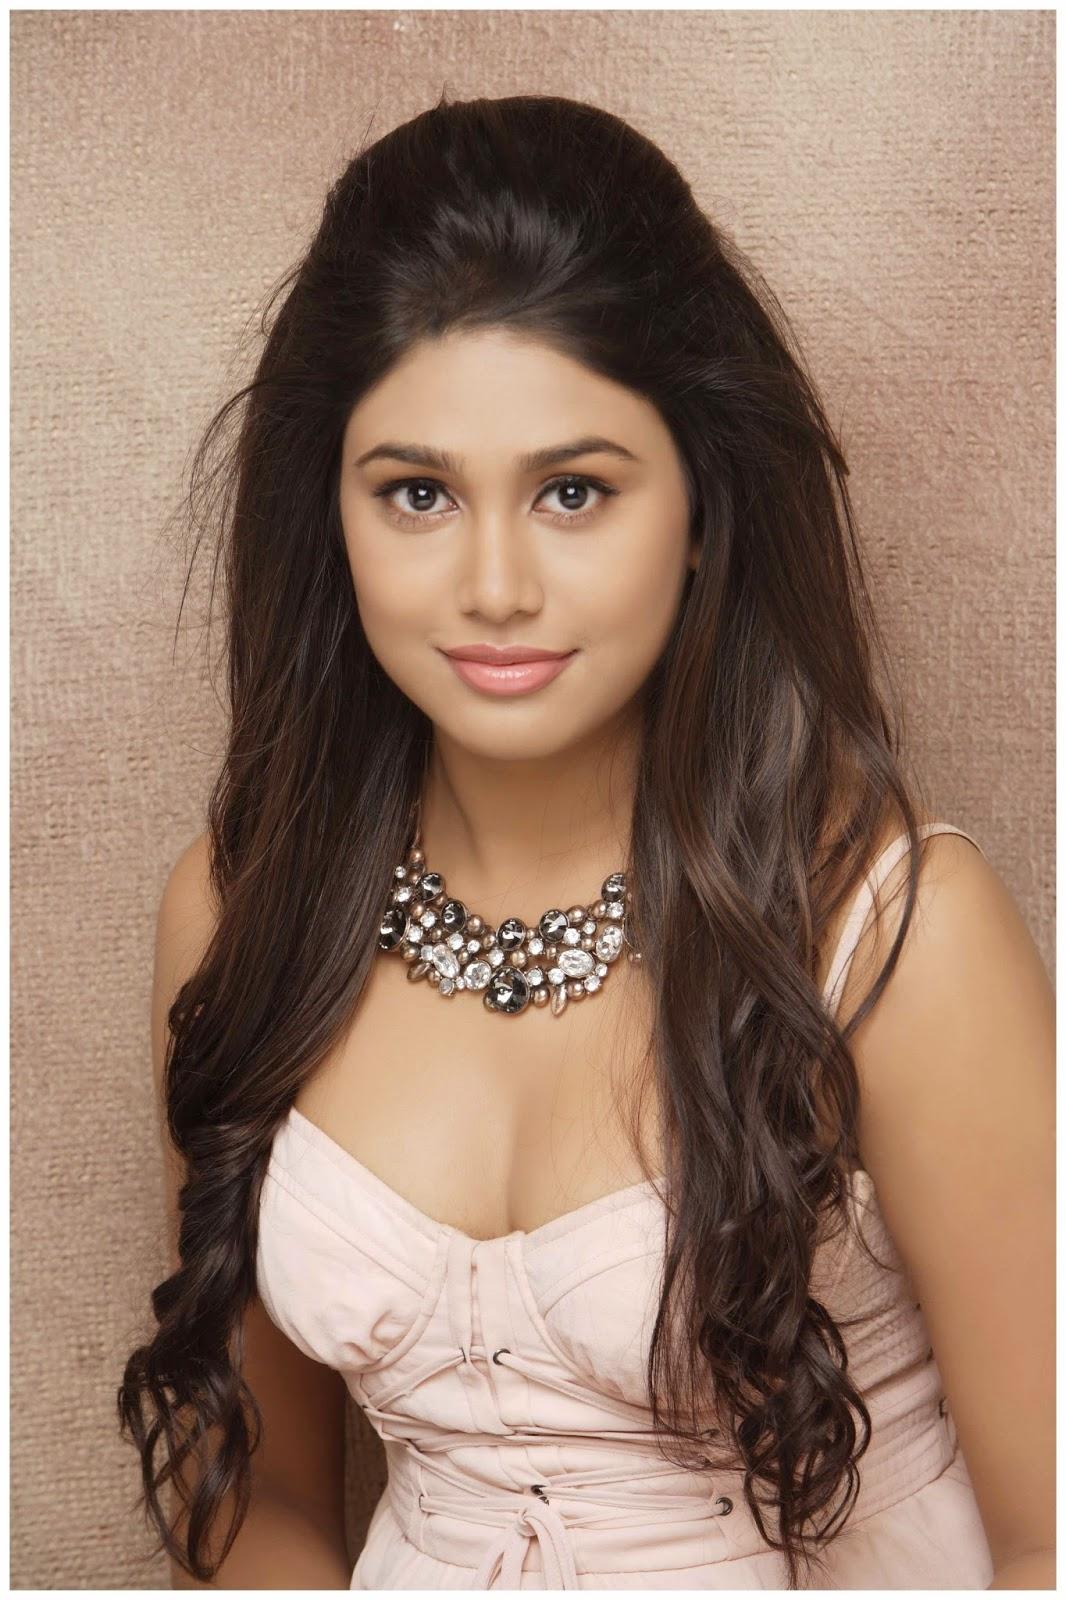 manisha-yadav-hot-photoshoot-stills-24